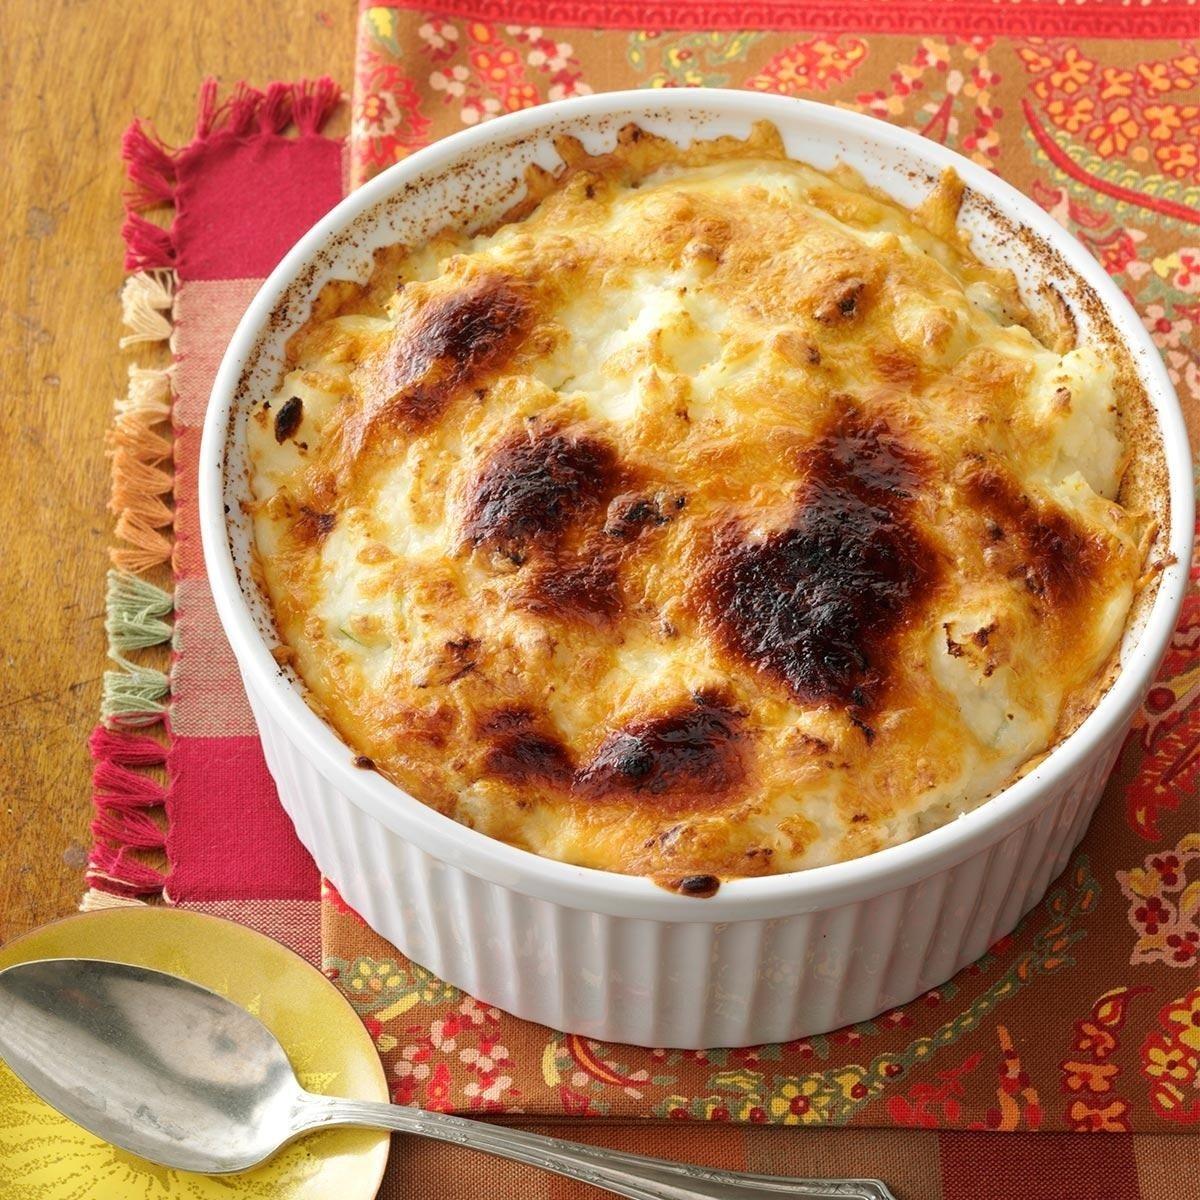 10 Unique Ideas For Leftover Mashed Potatoes mozzarella mashed potato remix recipe taste of home 2021